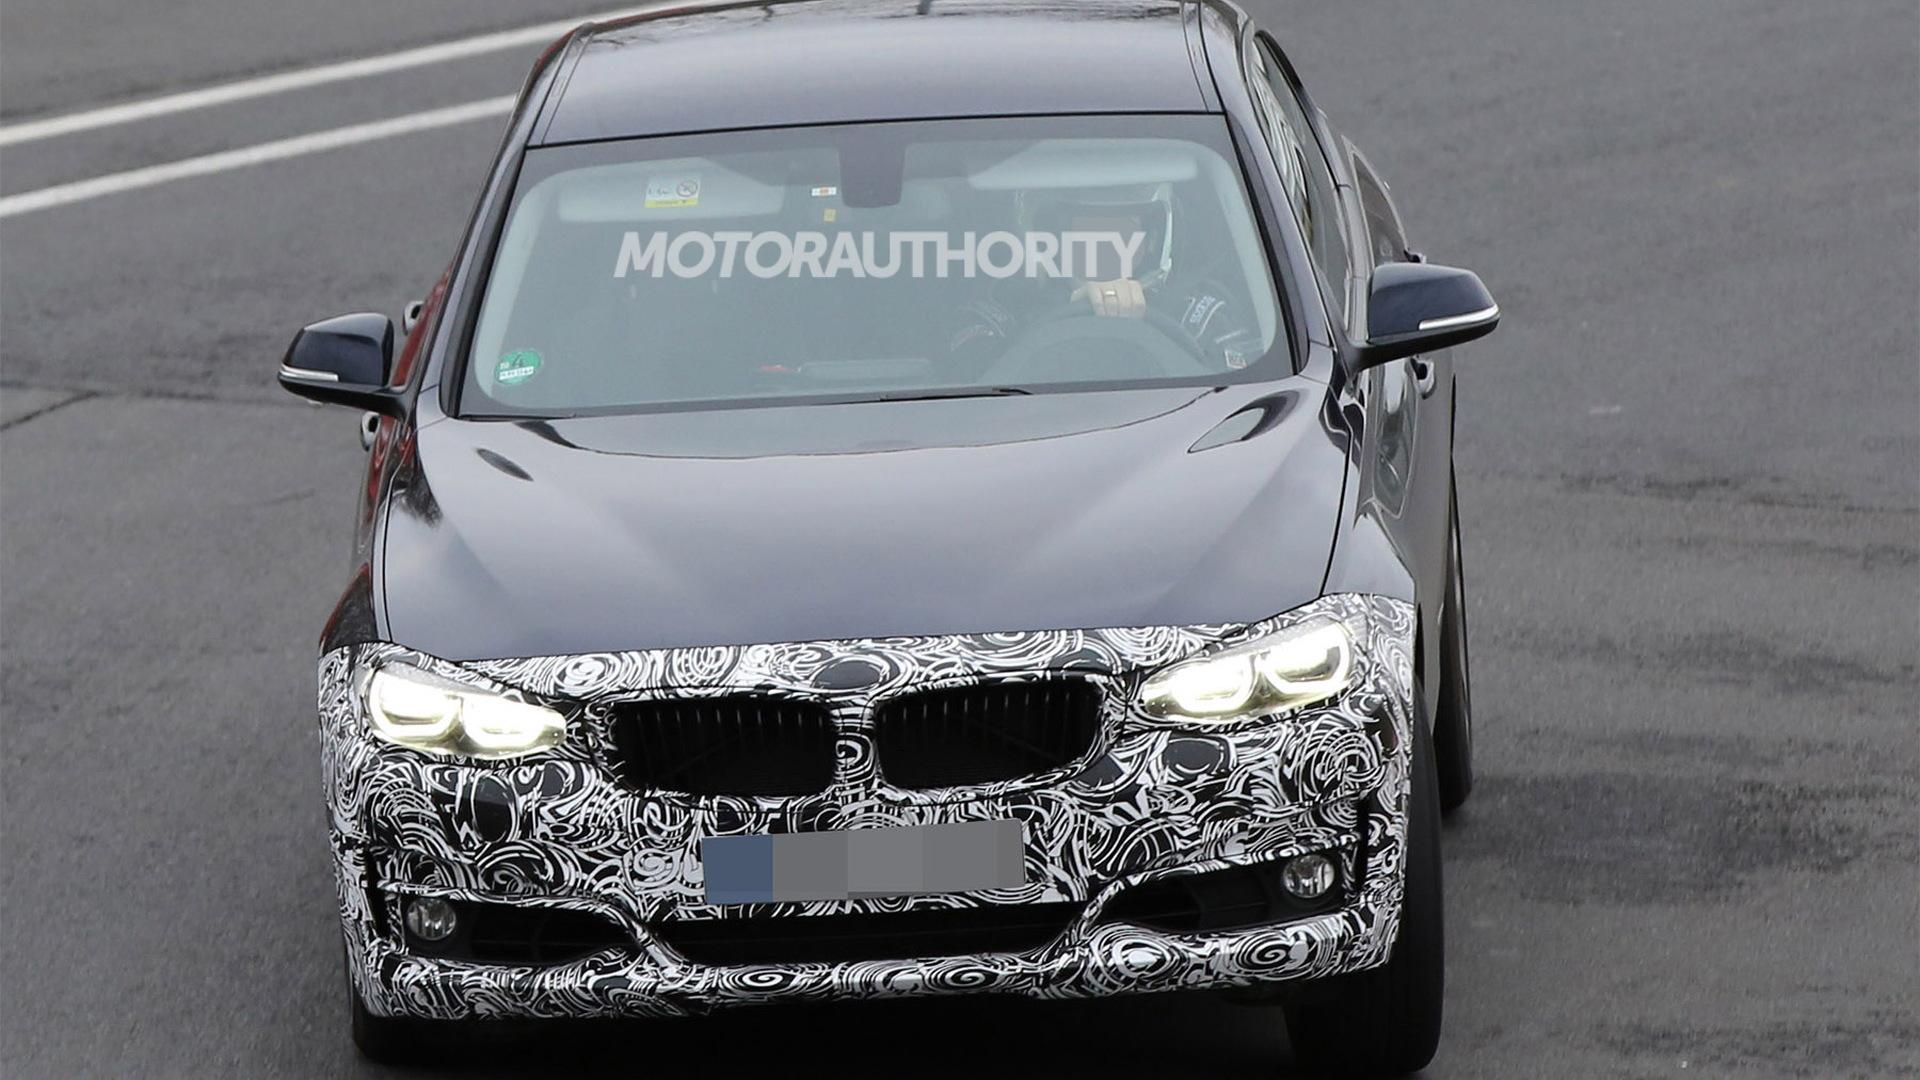 2017 BMW 3-Series Gran Turismo facelift spy shots - Image via S. Baldauf/SB-Medien